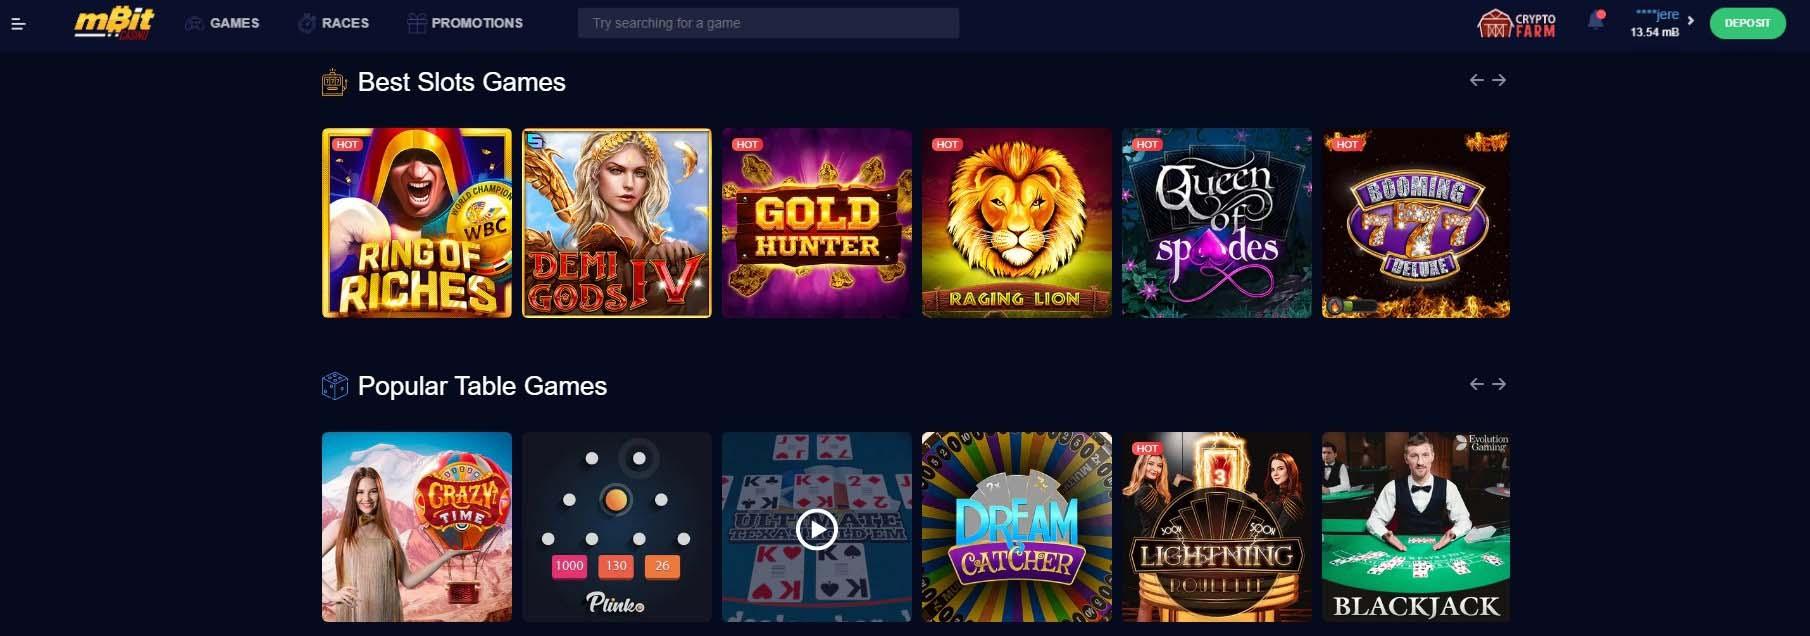 Best Online Casinos in 18   The Most Popular Real Money Casino ...